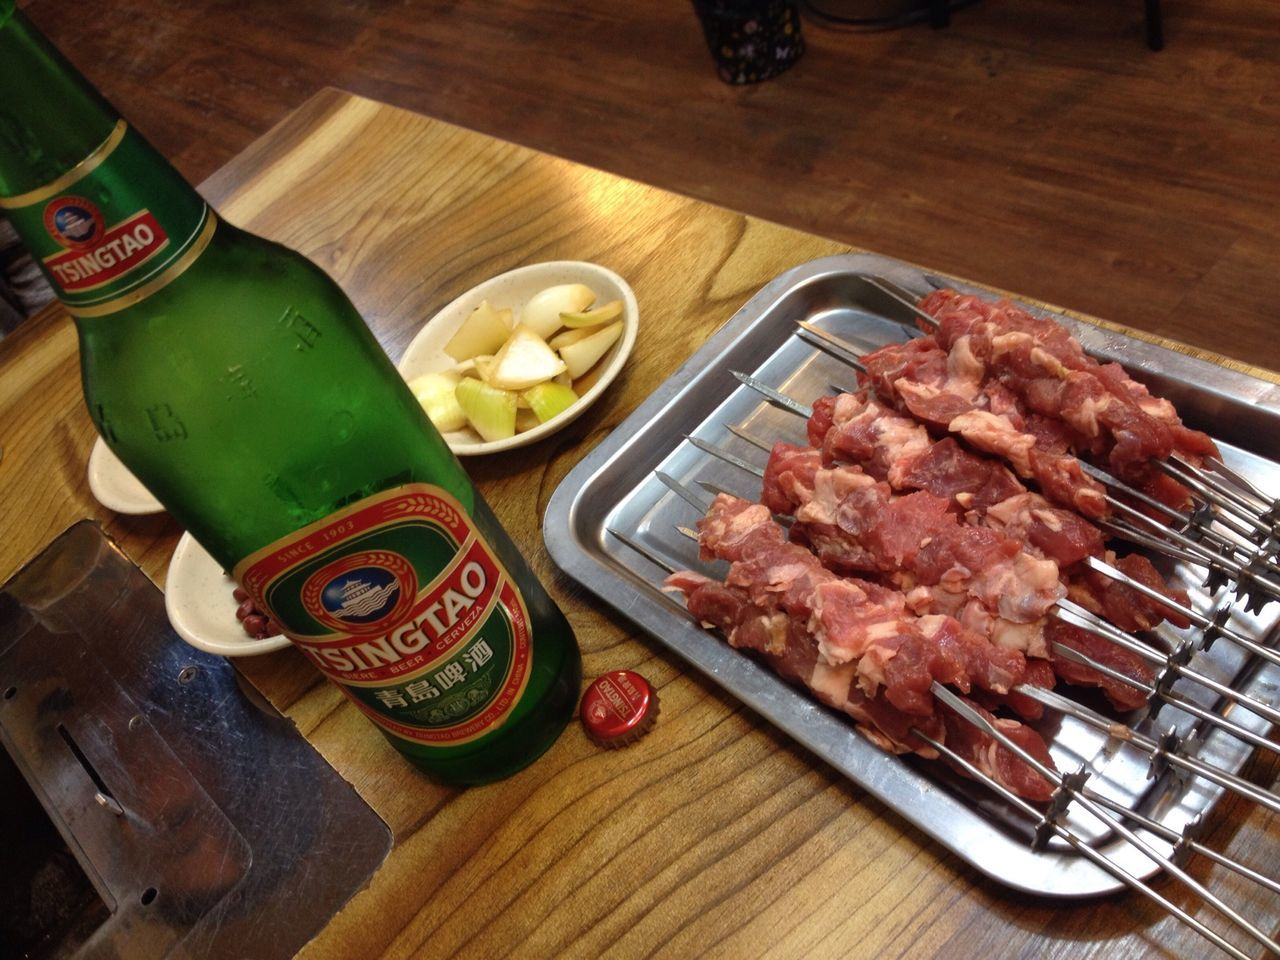 Lamb Skewers Beer Tsingtao 양꼬치! 아오 맛나ㅠ???????